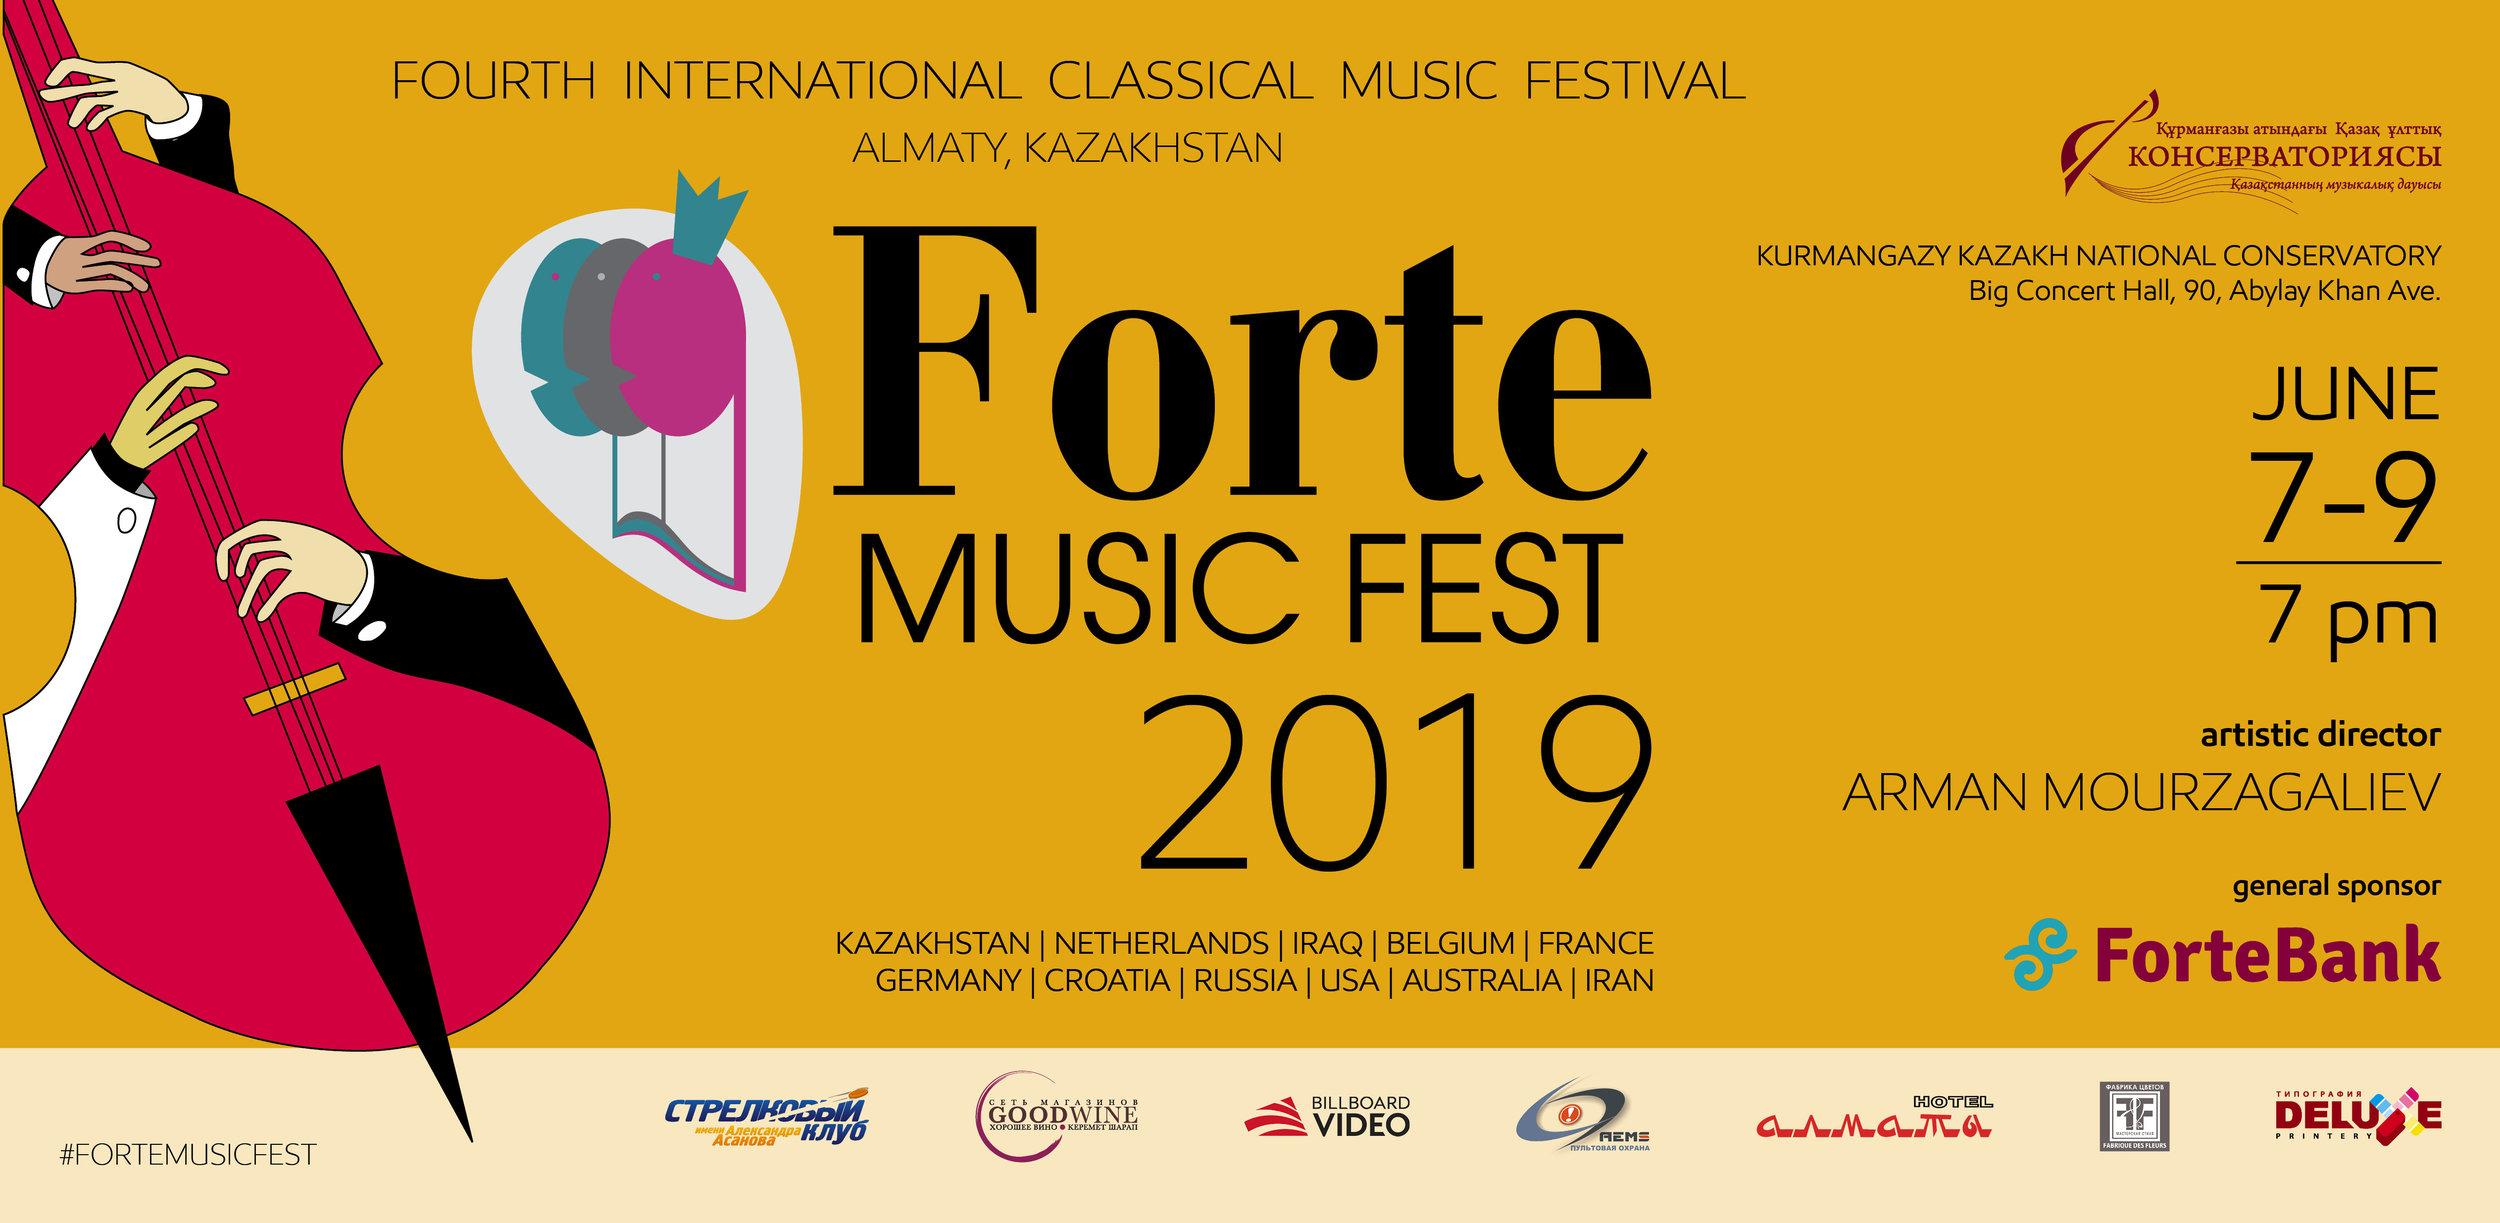 Forte Music Fest 2019_www_ 2424x1186 pix-ENG.jpg